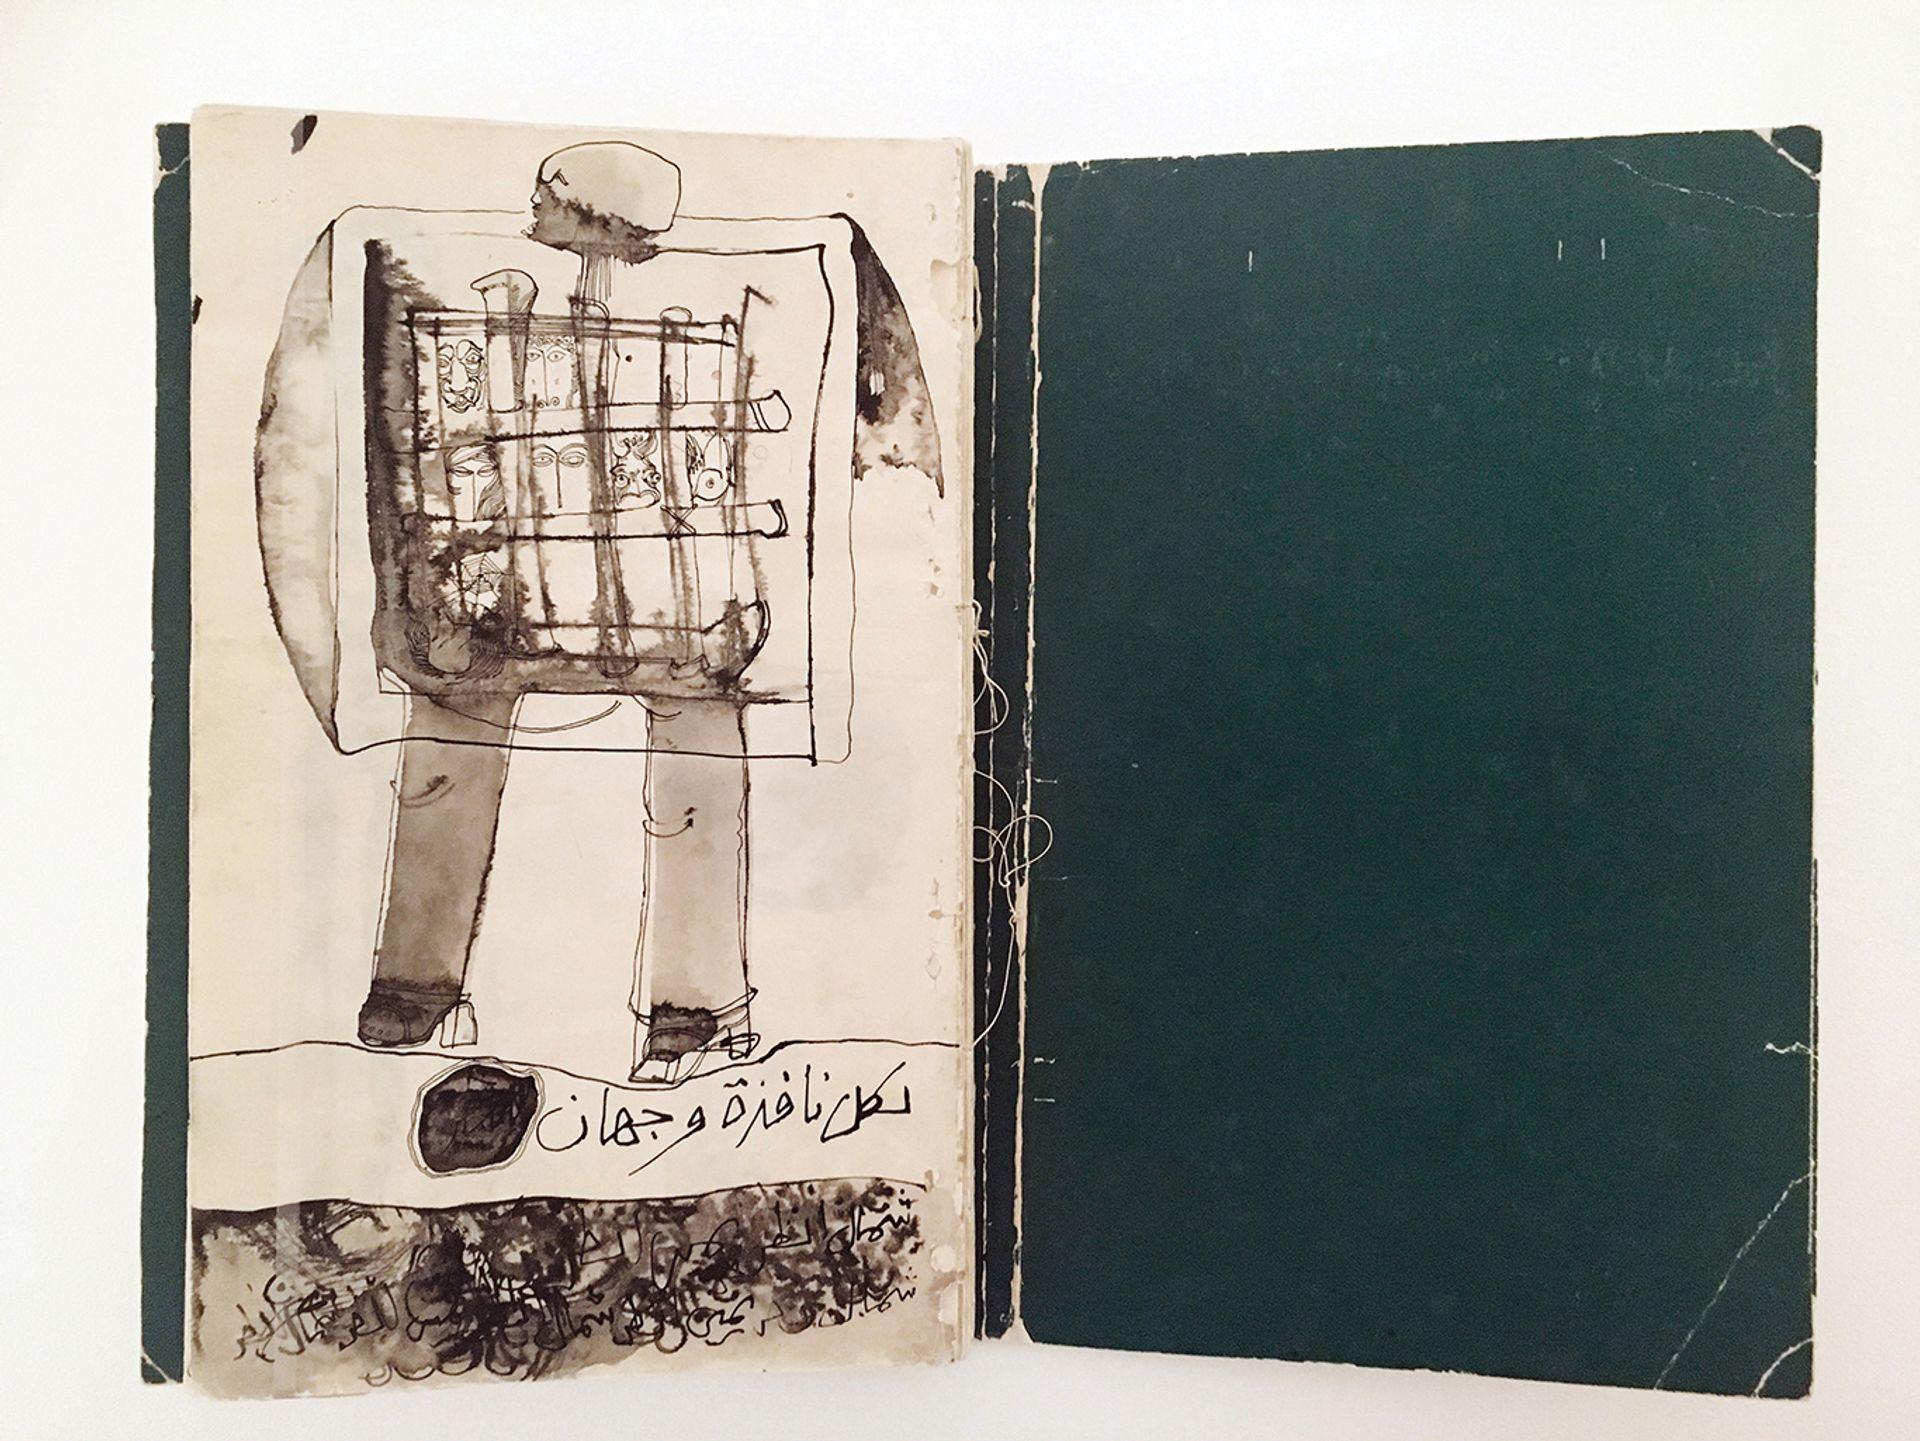 An excerpt from Ibrahim El-Salahi's Prison Notebook at the Museum of Modern Art Museum of Modern Art